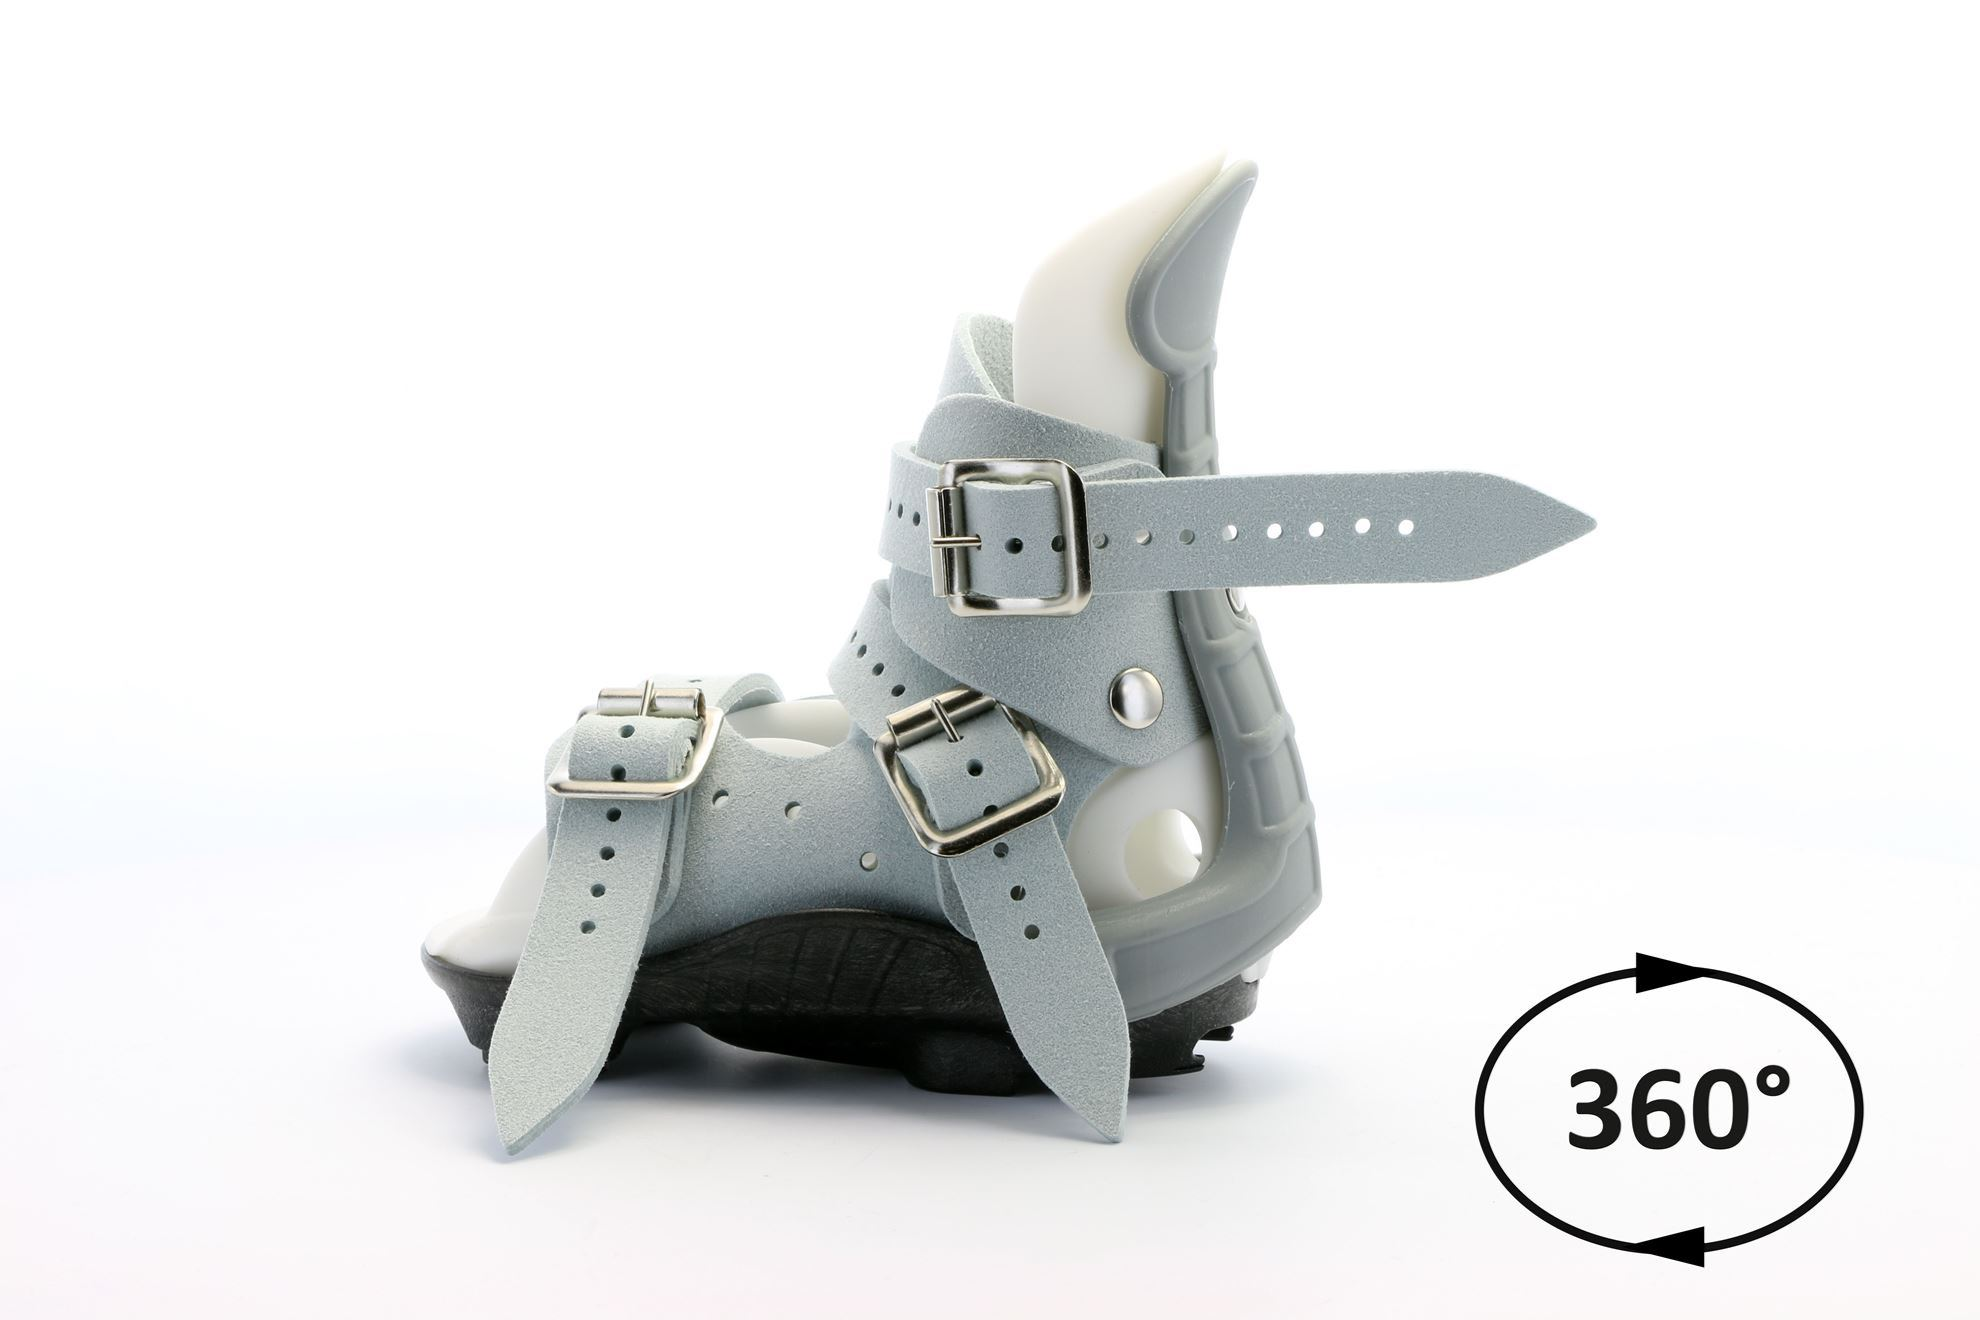 Ponseti AFO Plantar Flexion Stop Sandals - Single